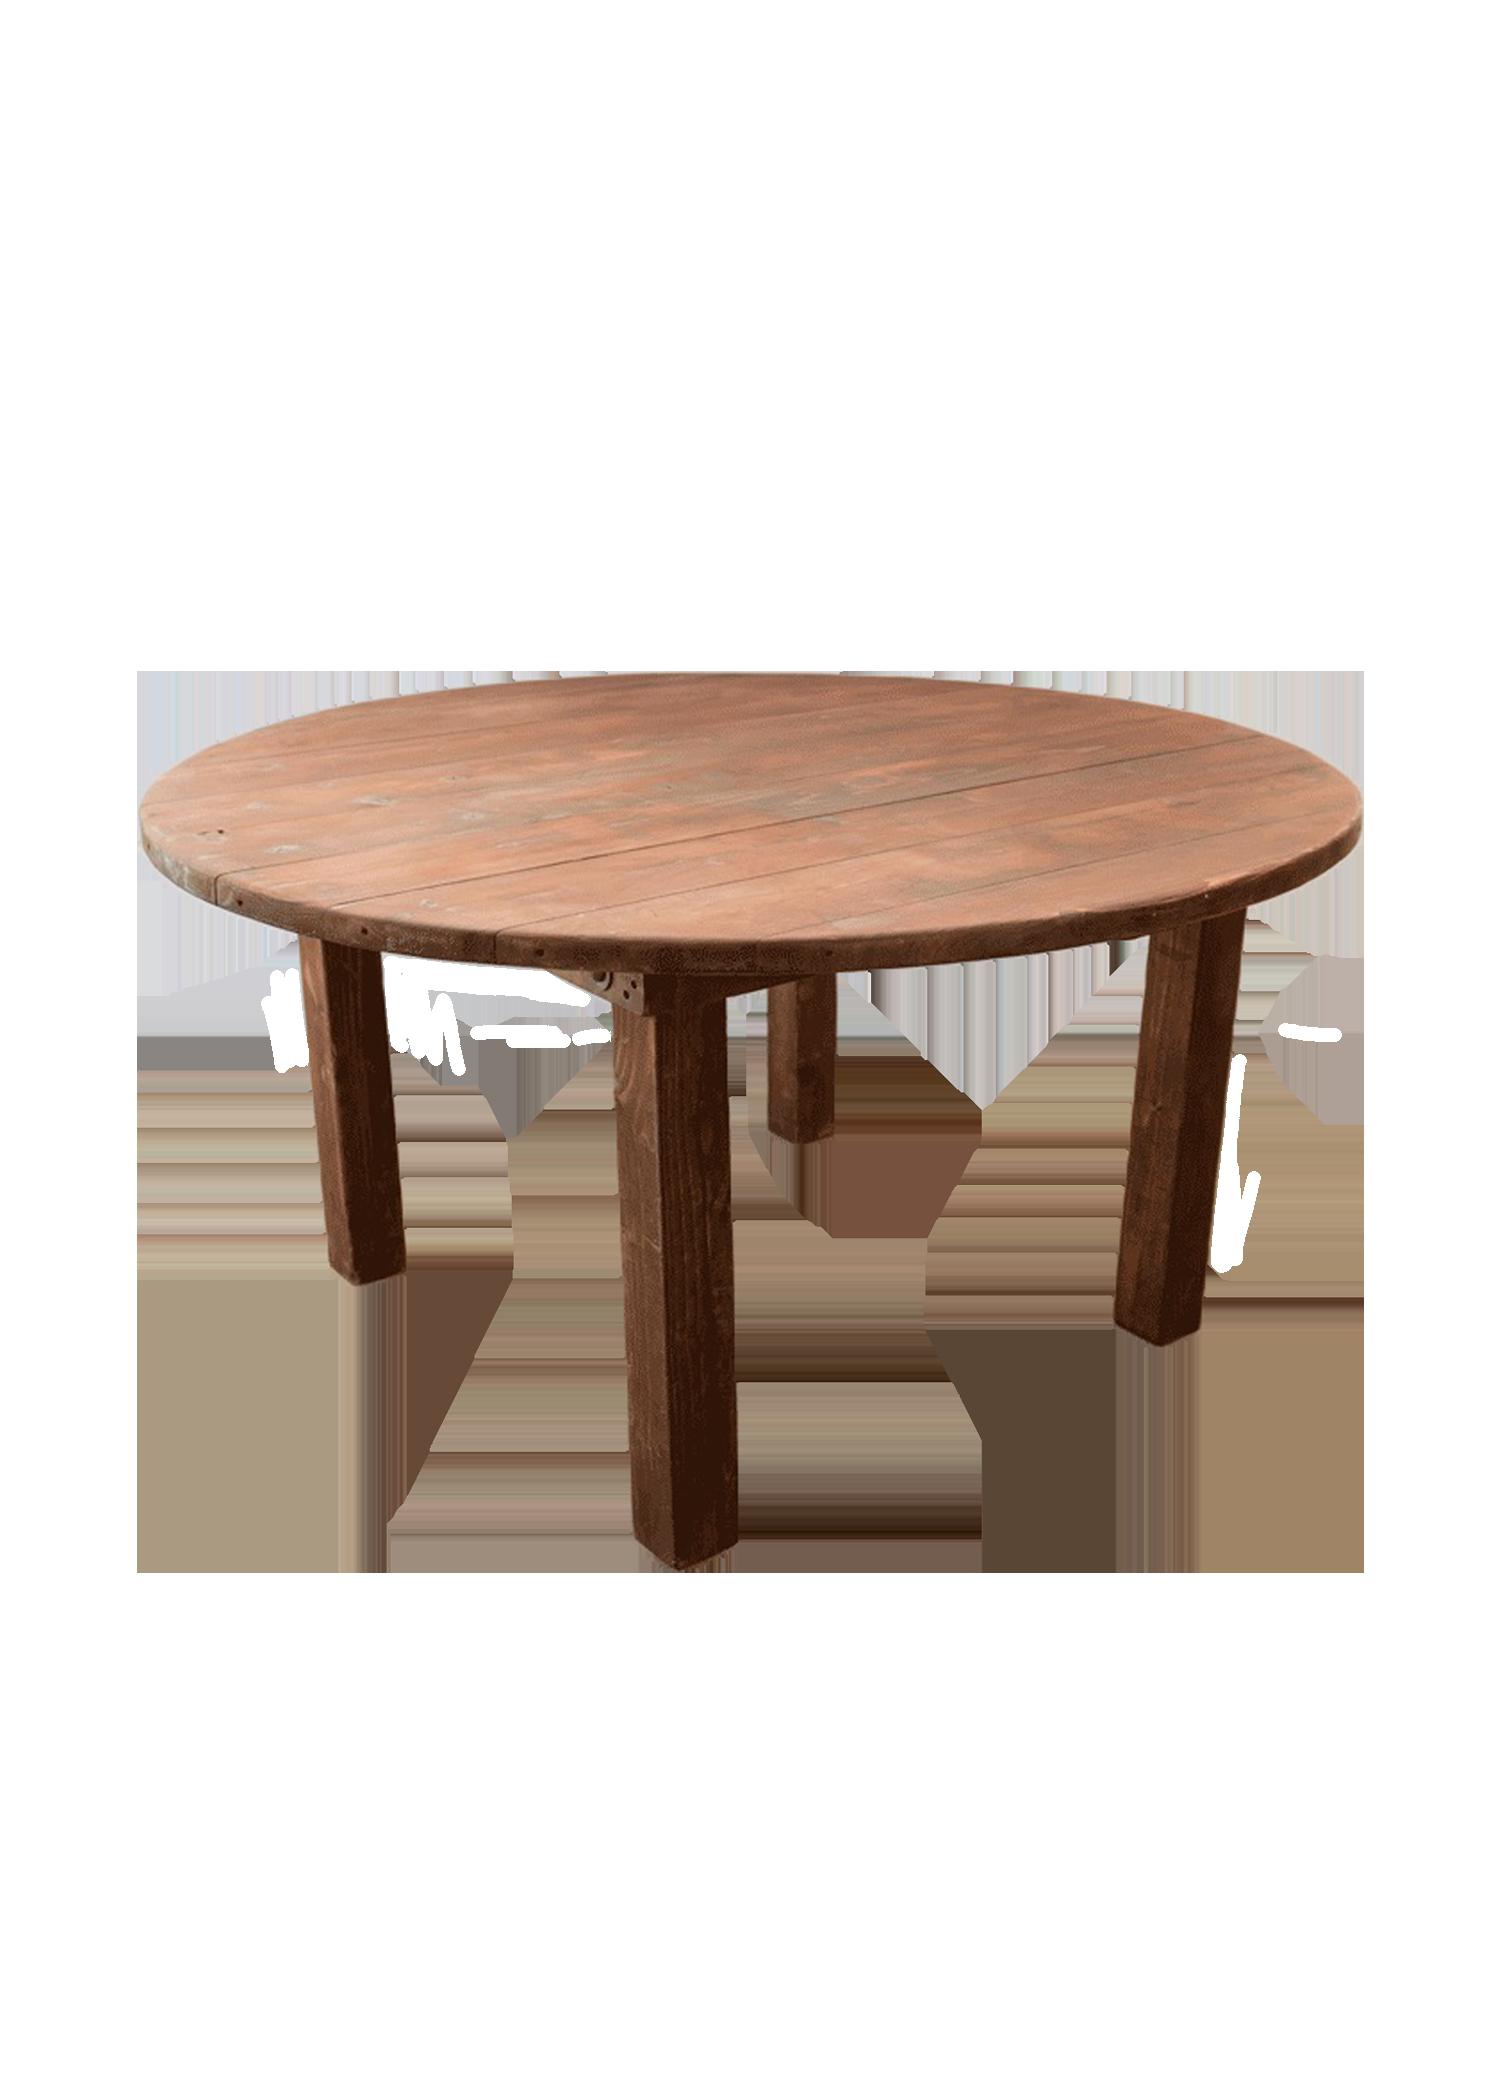 Honey Brown Round Farm Table